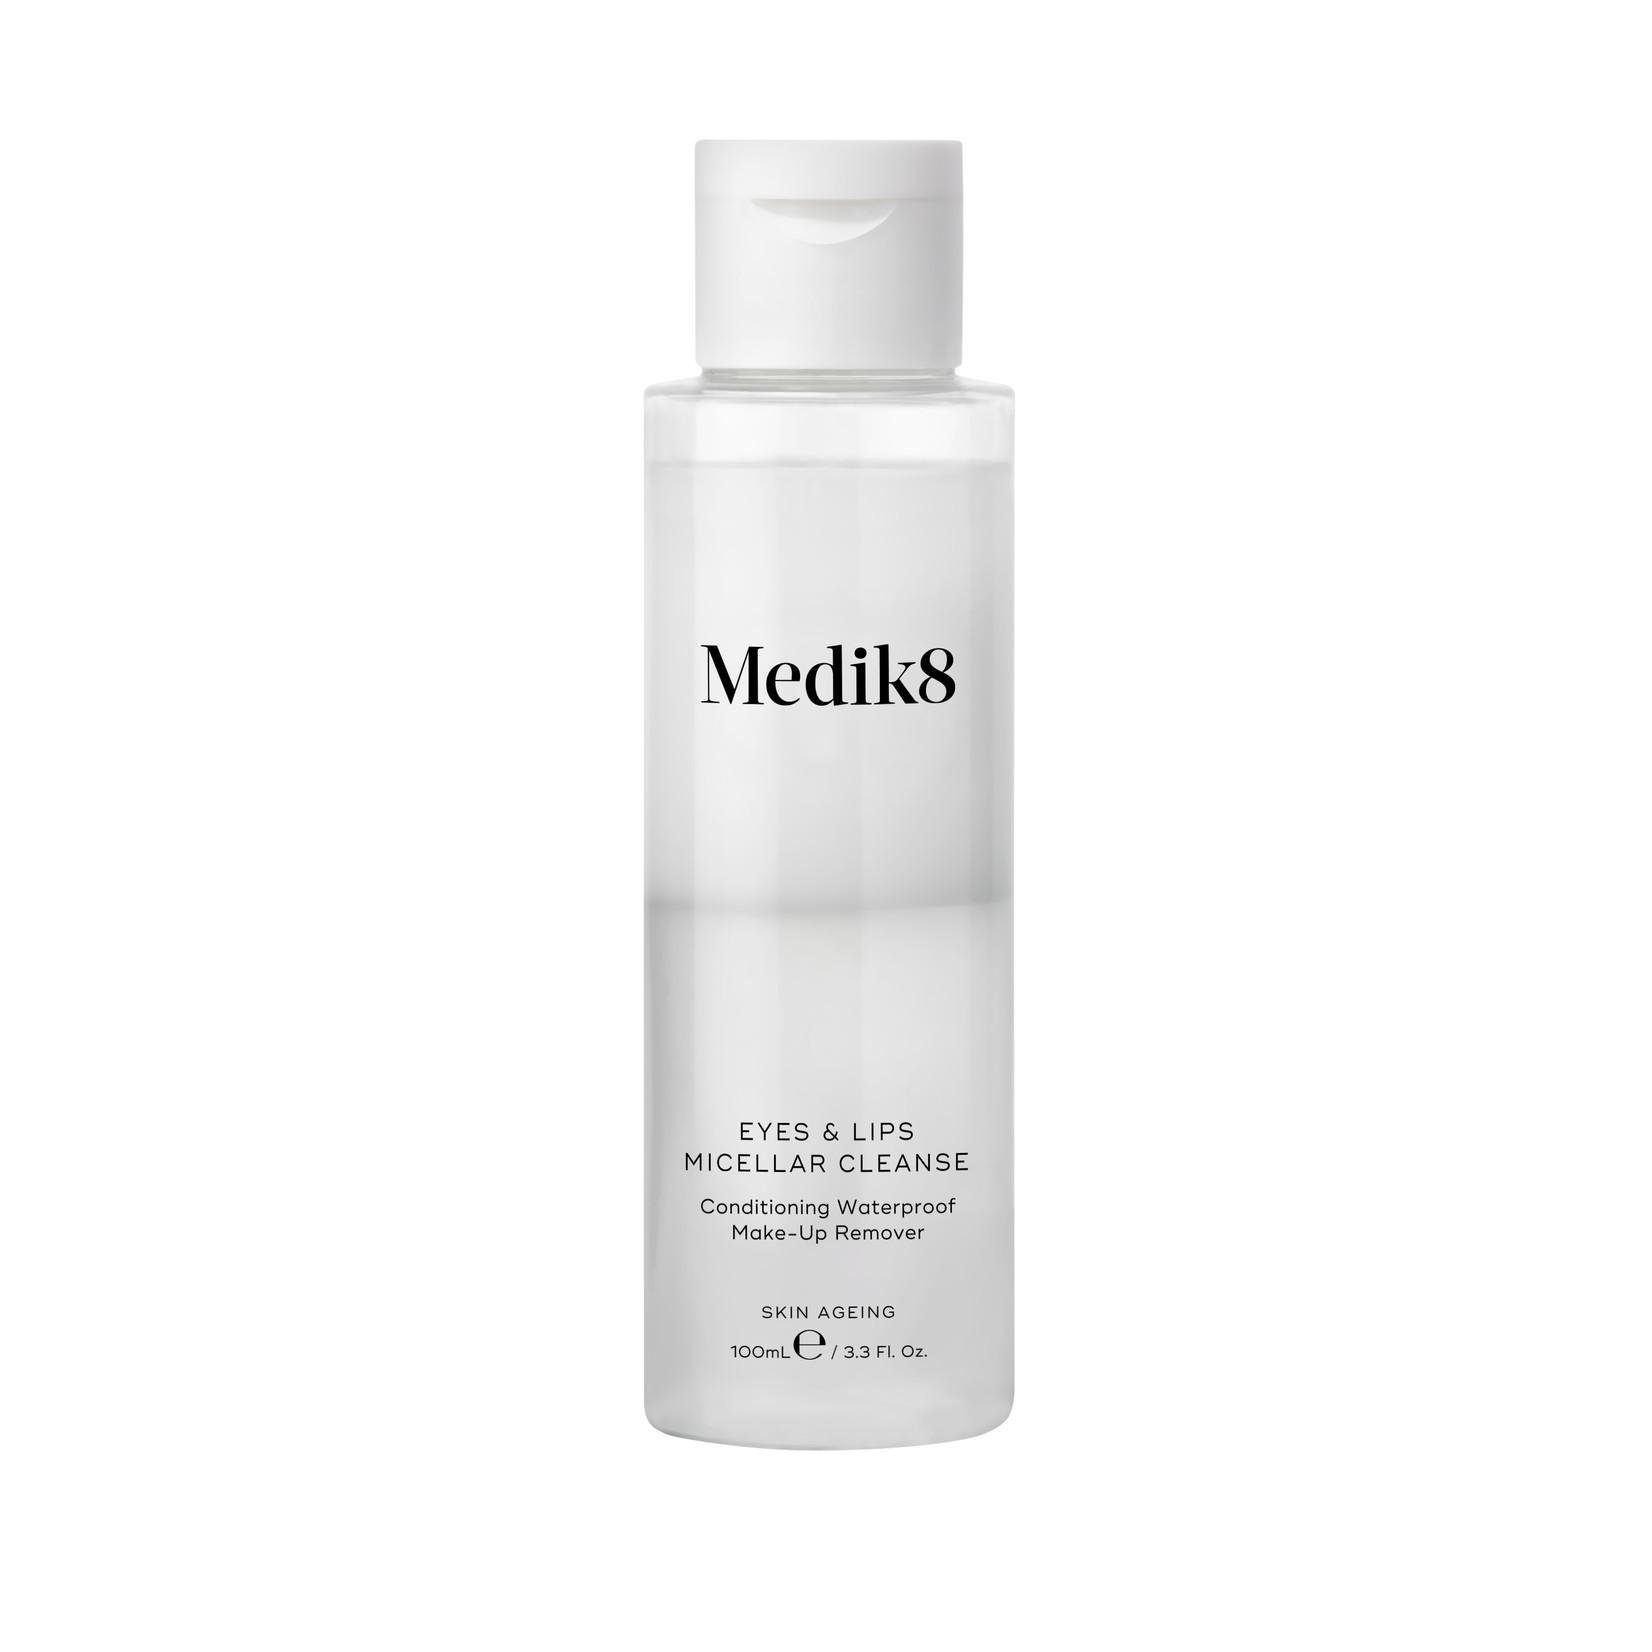 Medik8 Conditioning Waterproof Make-Up Remover